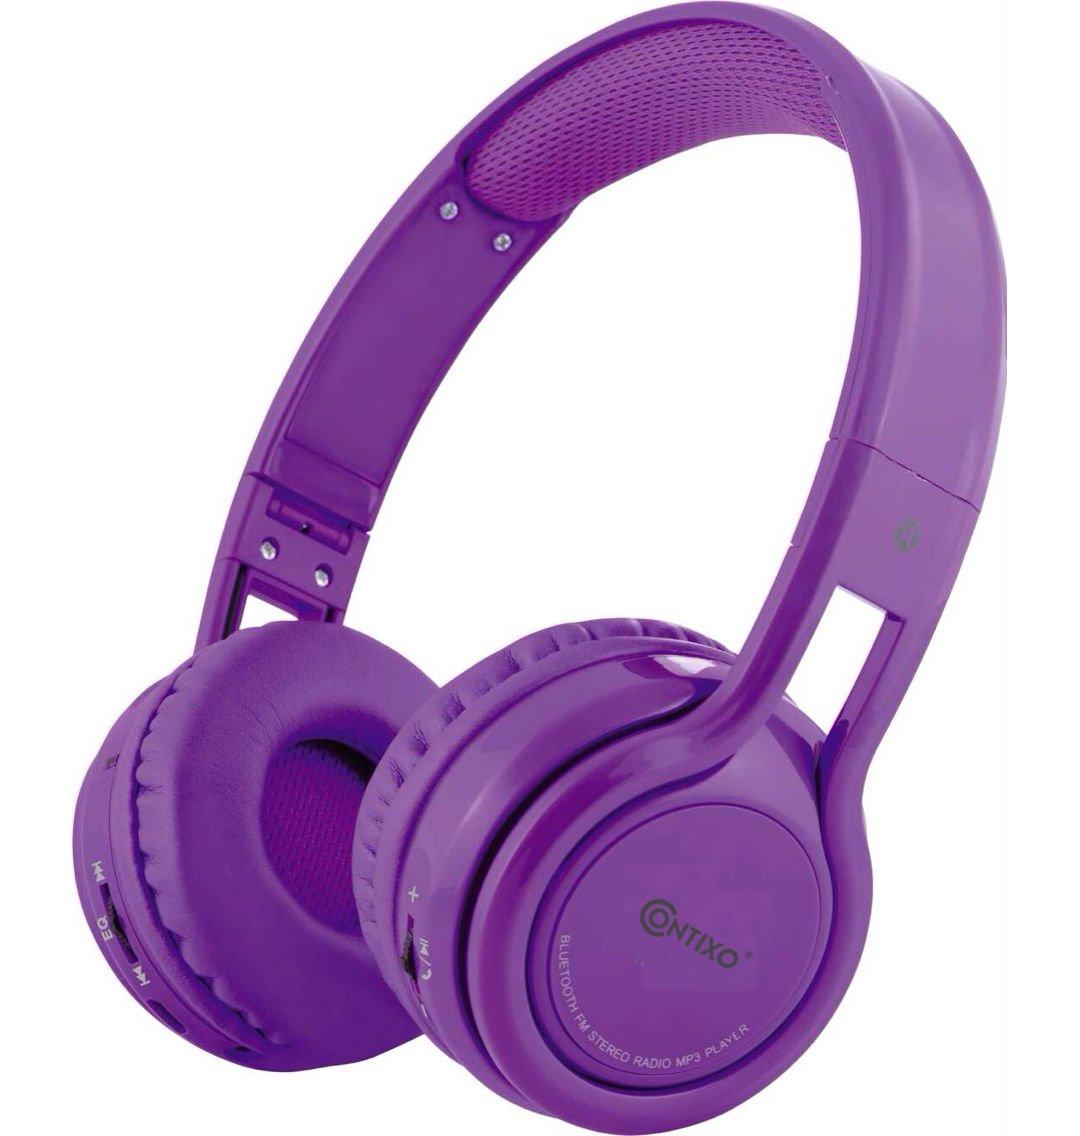 Amazon.com: Contixo KB2600 Kid Safe 85db Foldable Wireless Bluetooth Headphone Built-in Microphone, Micro SD card Music Player, FM Stereo Radio (Purple) ...